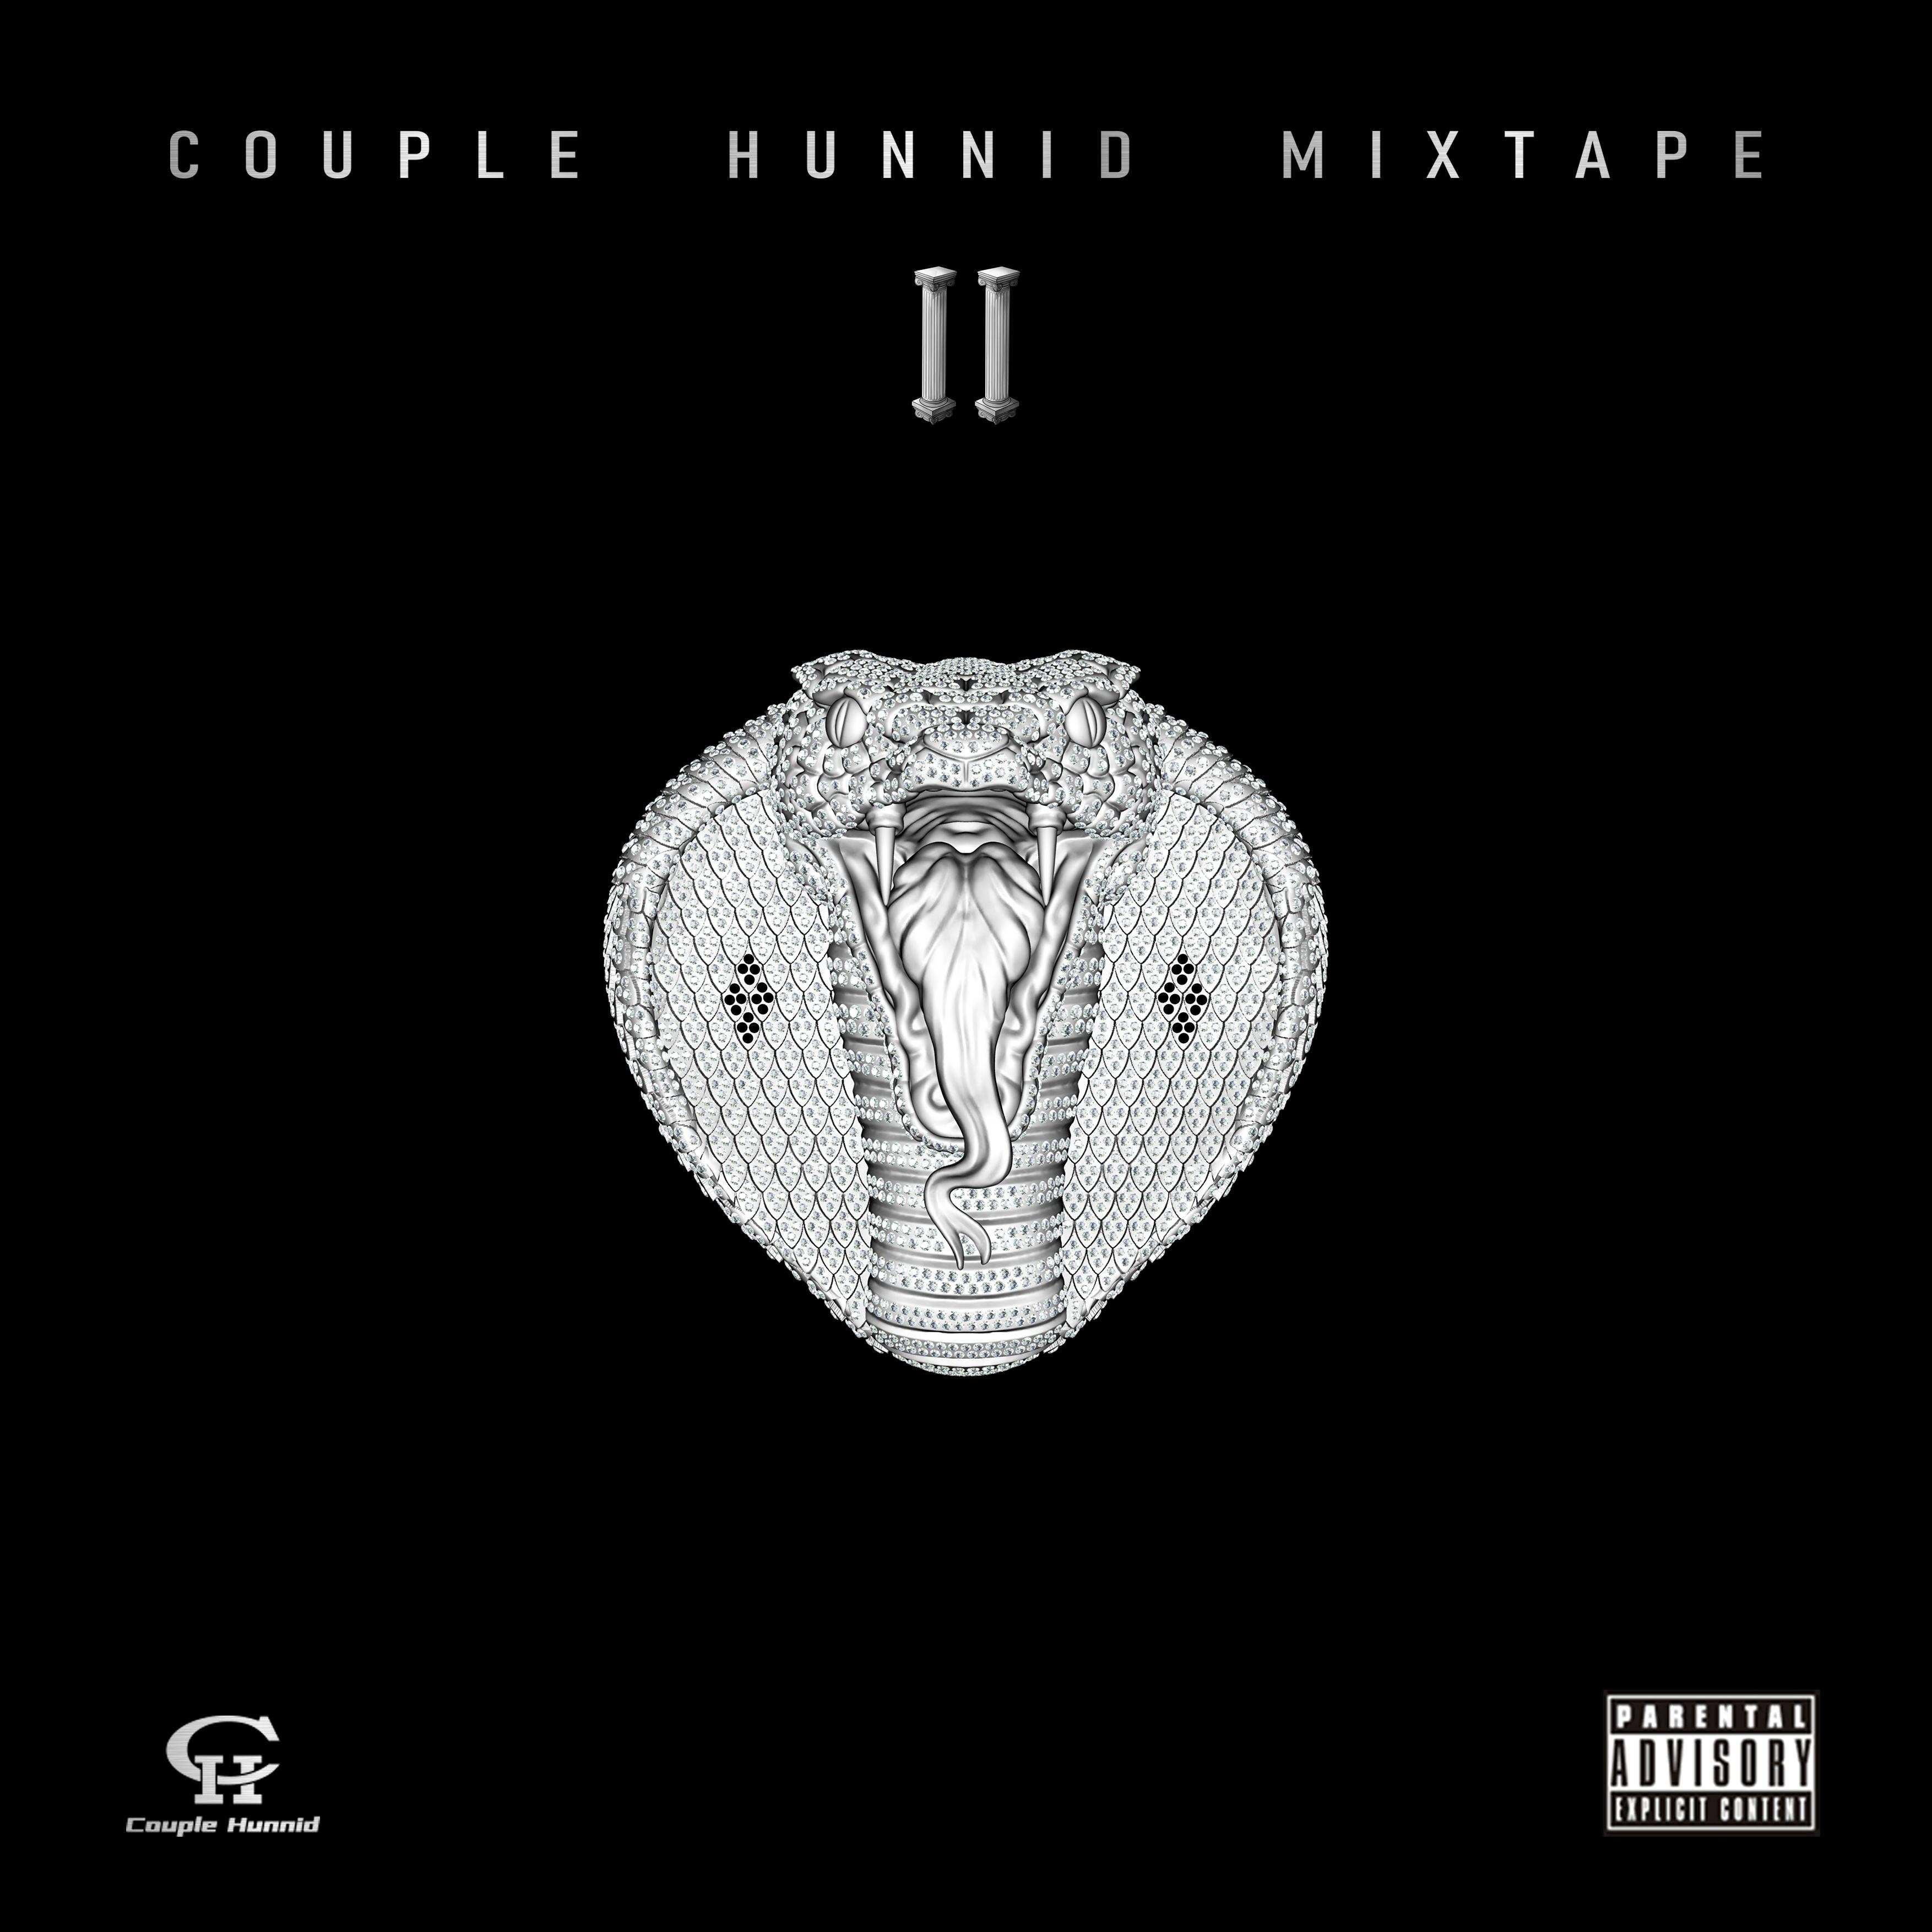 Couple Hunnid Mixtape Vol.2